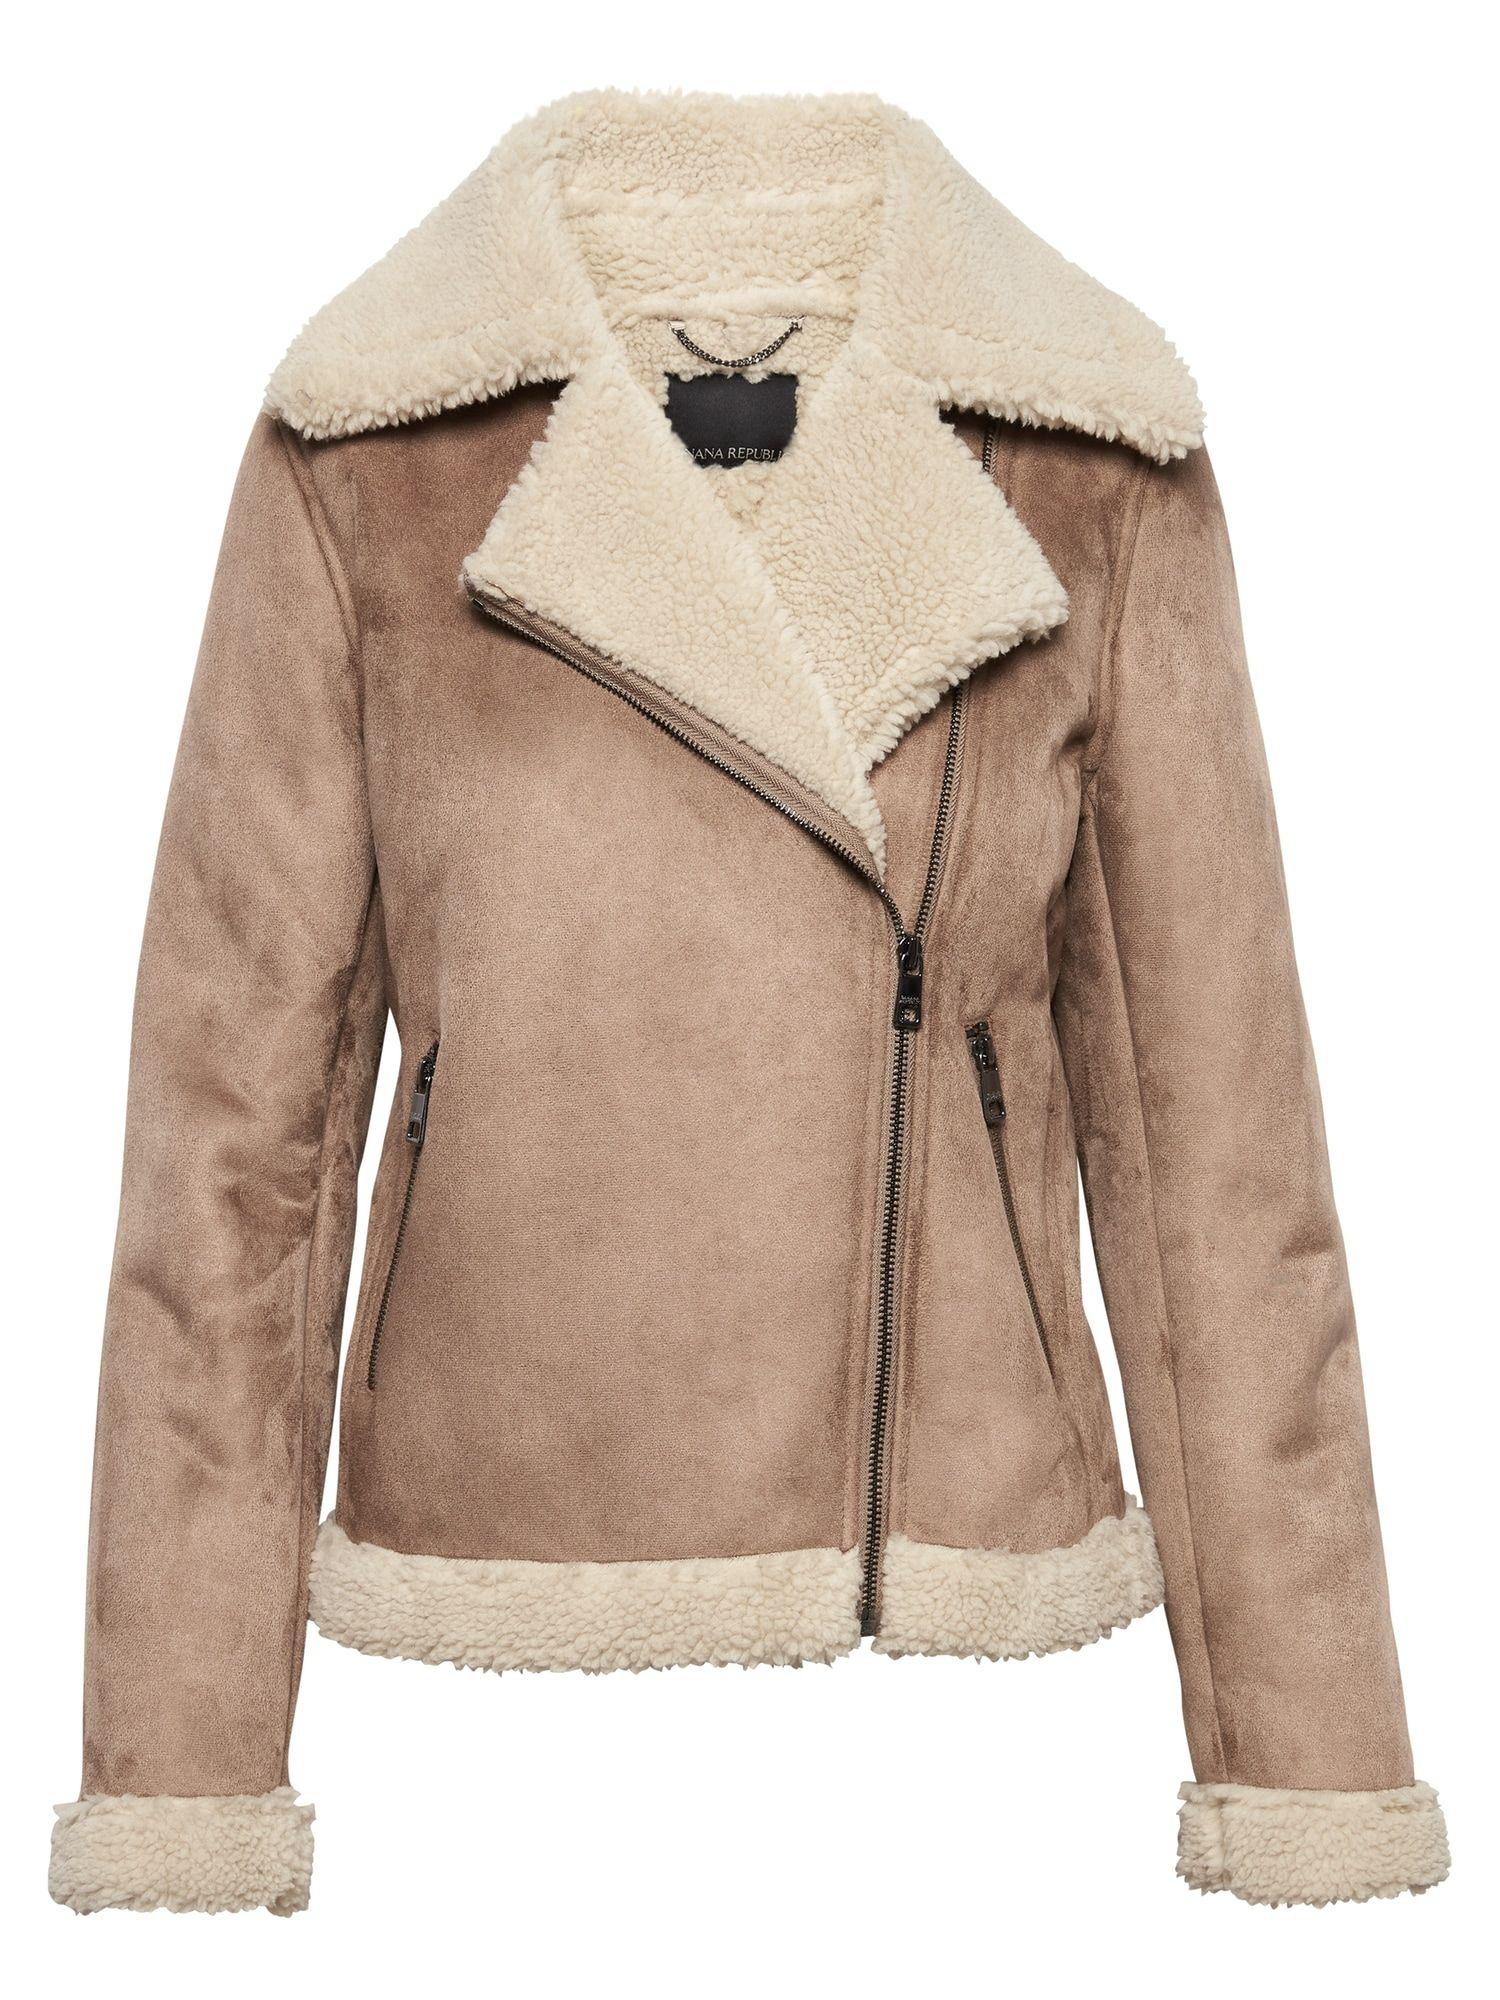 I love a good coat! BR 10/2018 Moto jacket, Jackets